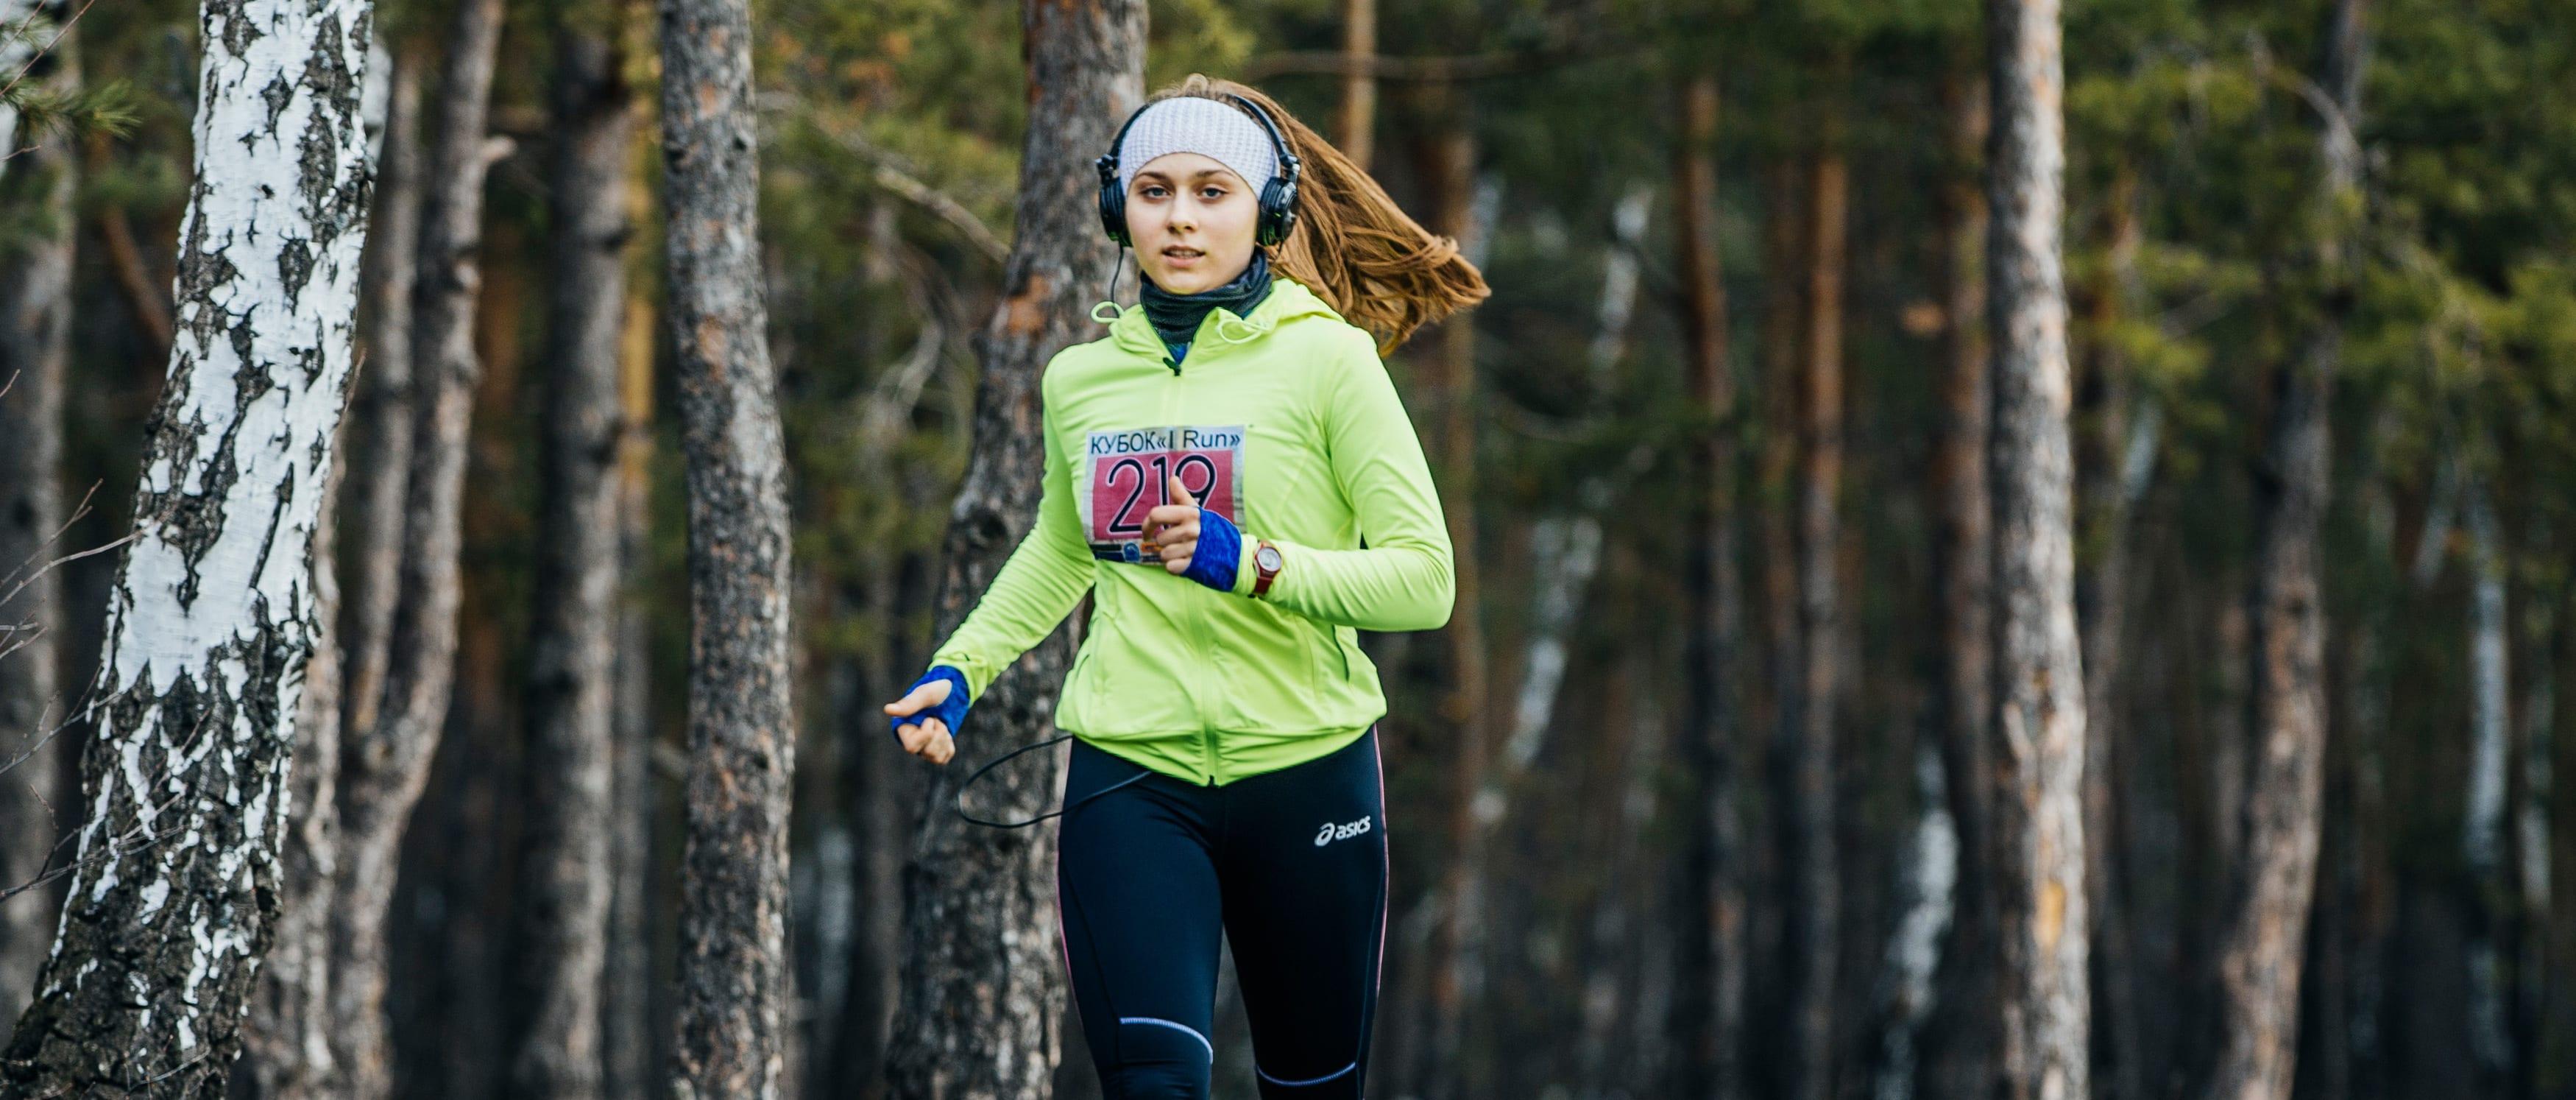 The Sherwood Pines Half Marathon & 10k